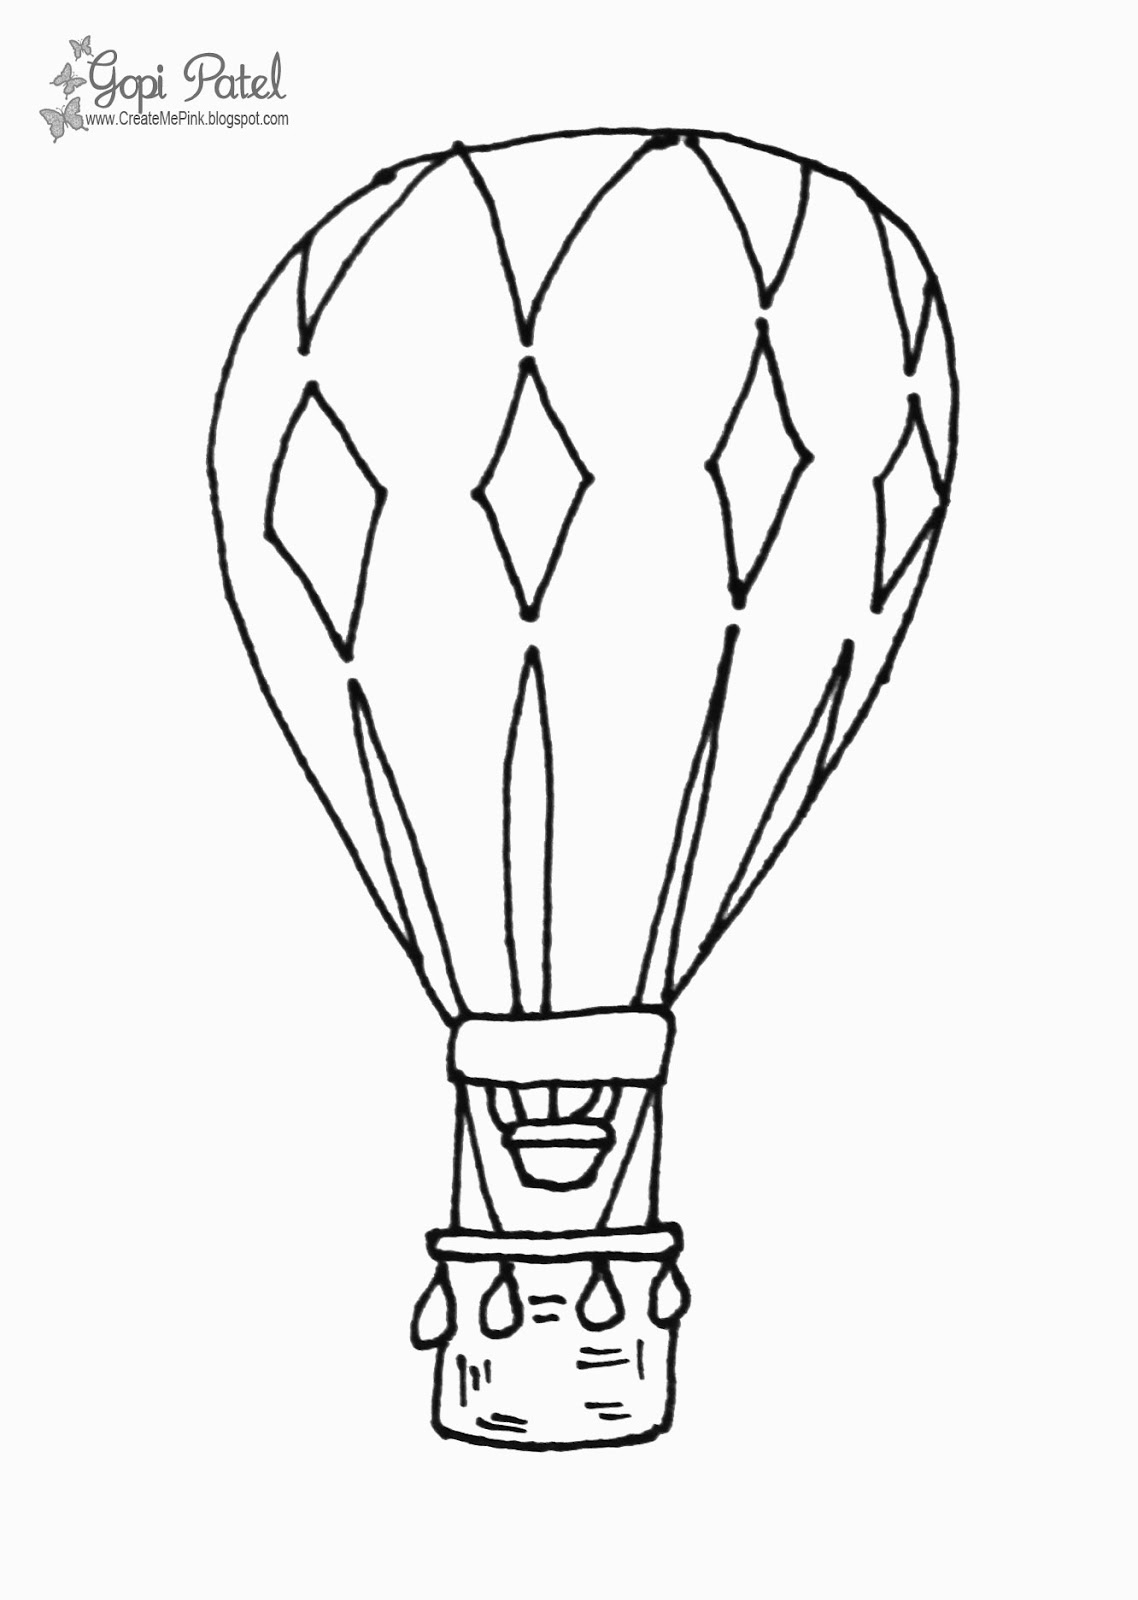 Create Me Pink Digital Stamps Hor Air Balloon Digi